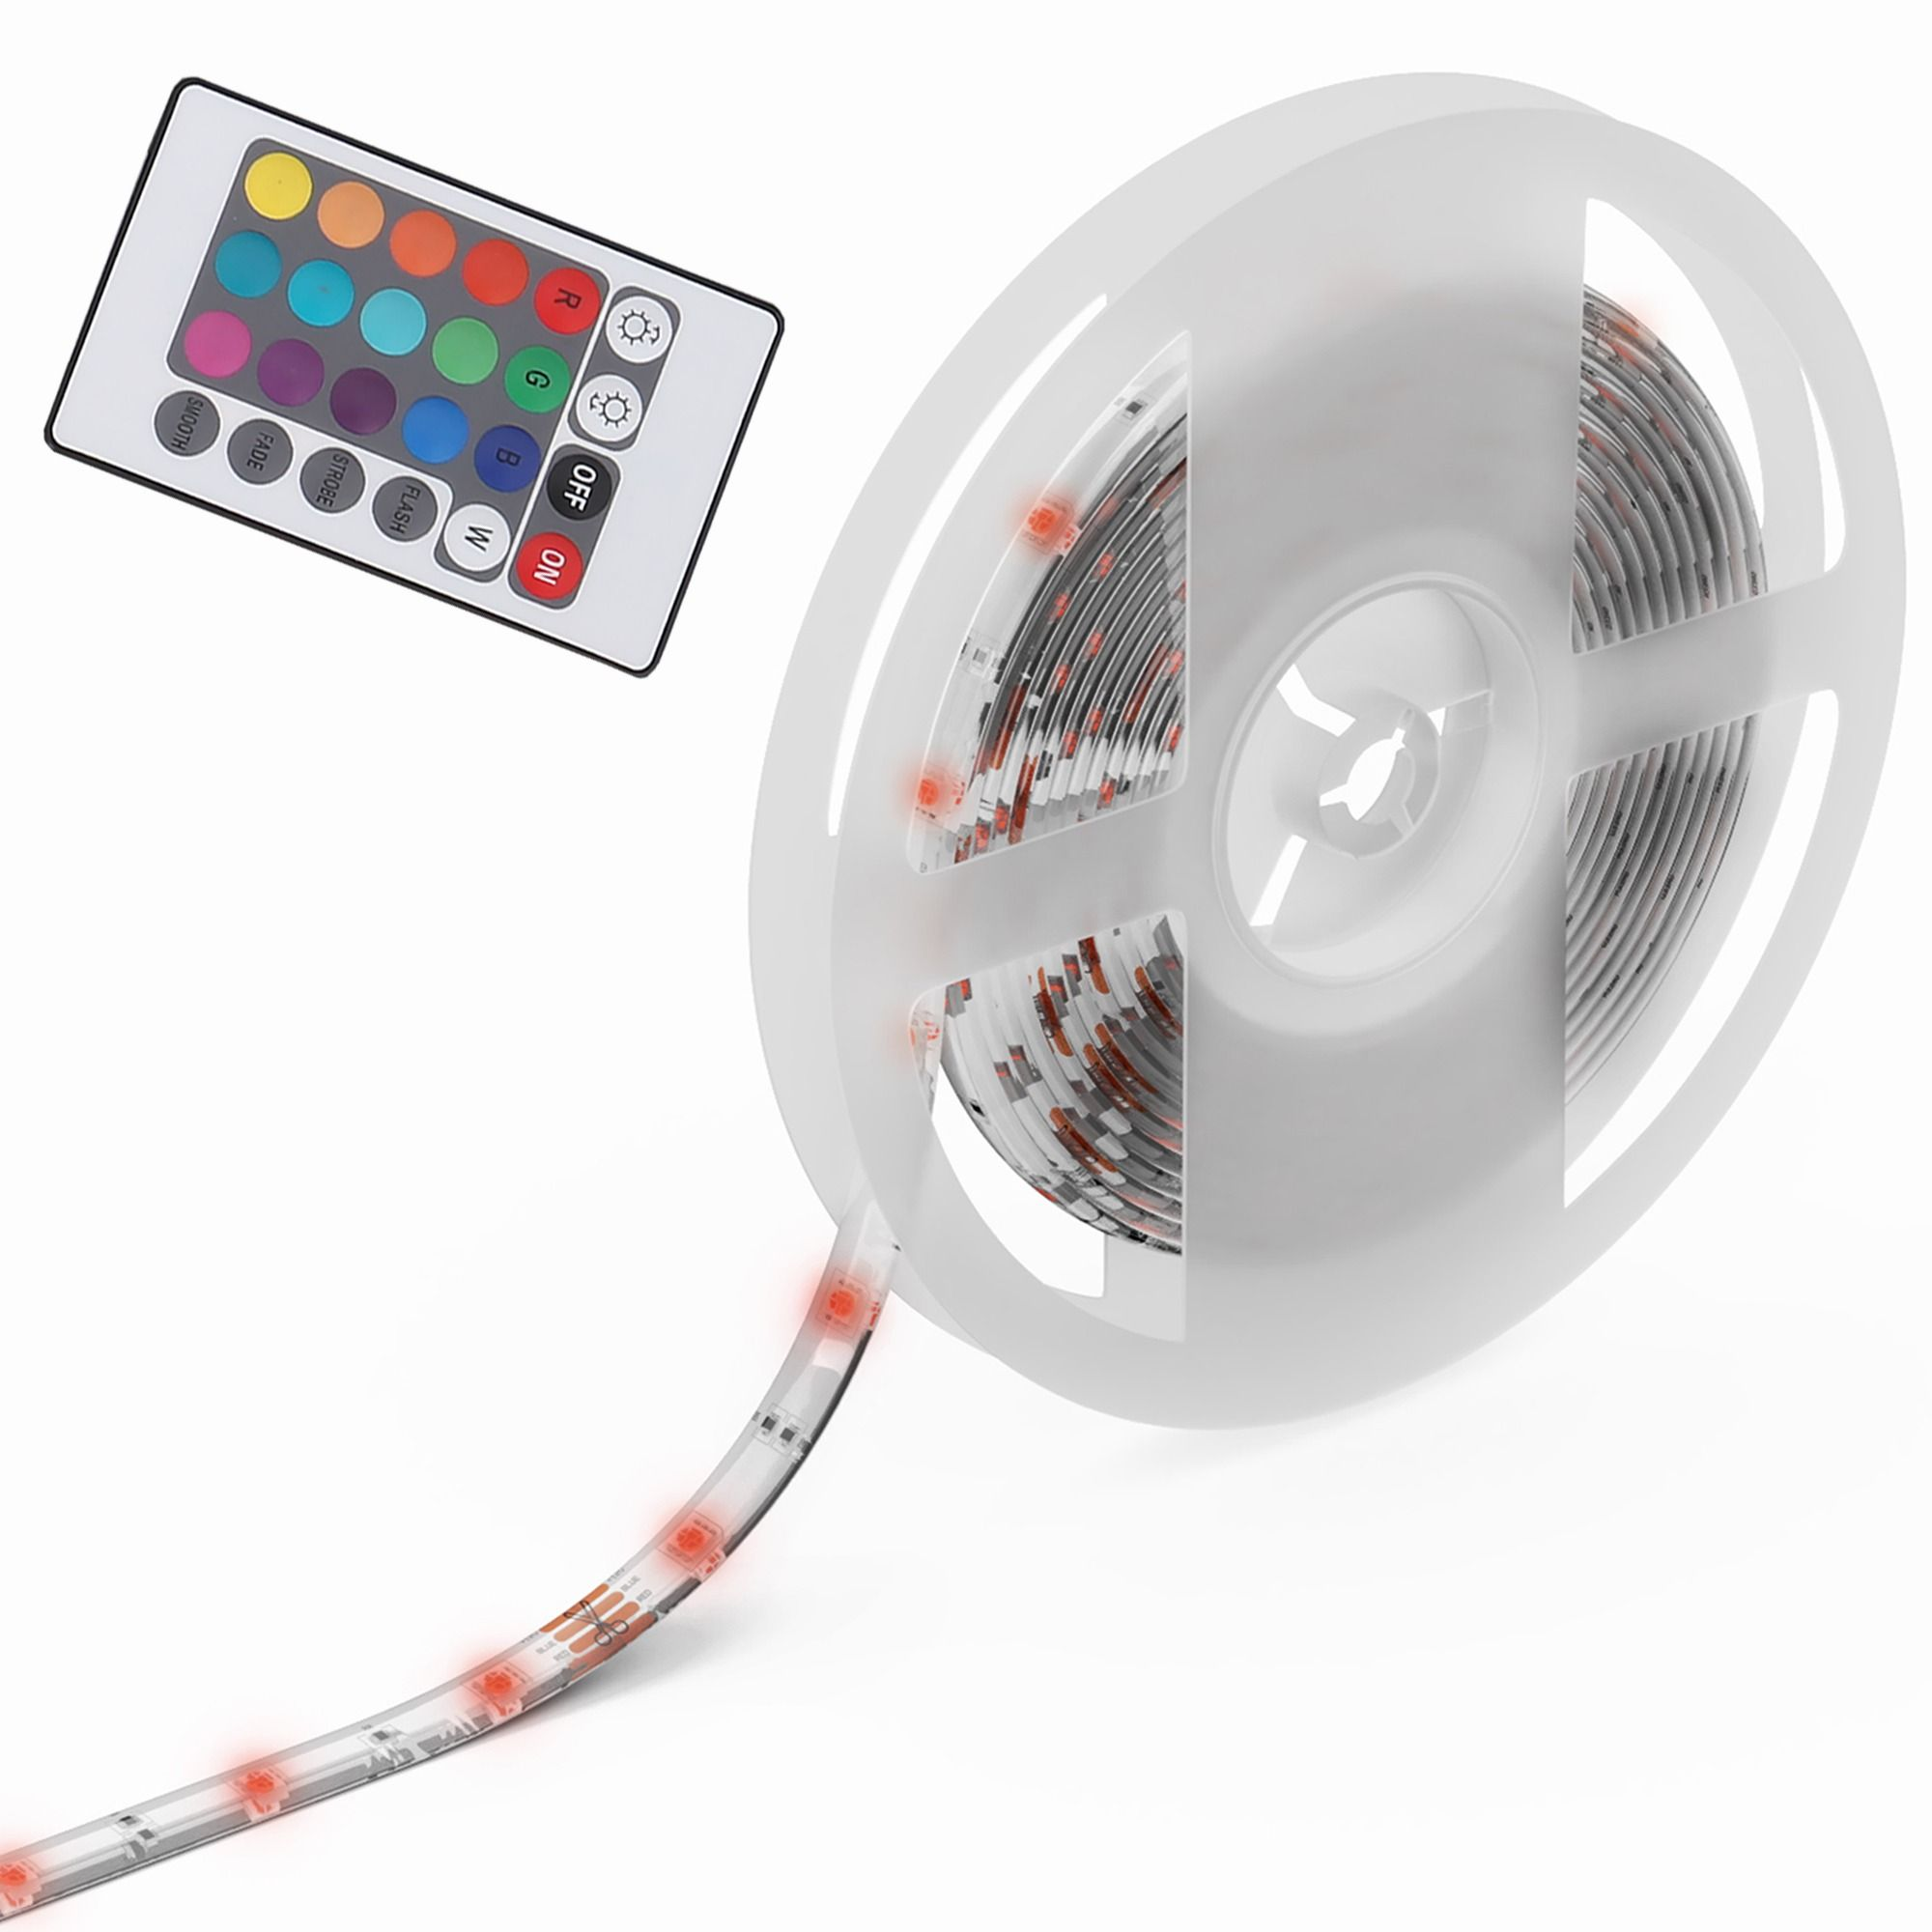 LED Leiste Stripes LED Bänder 5M  inkl Fernbedienung Farbwechsel Selbstklebend